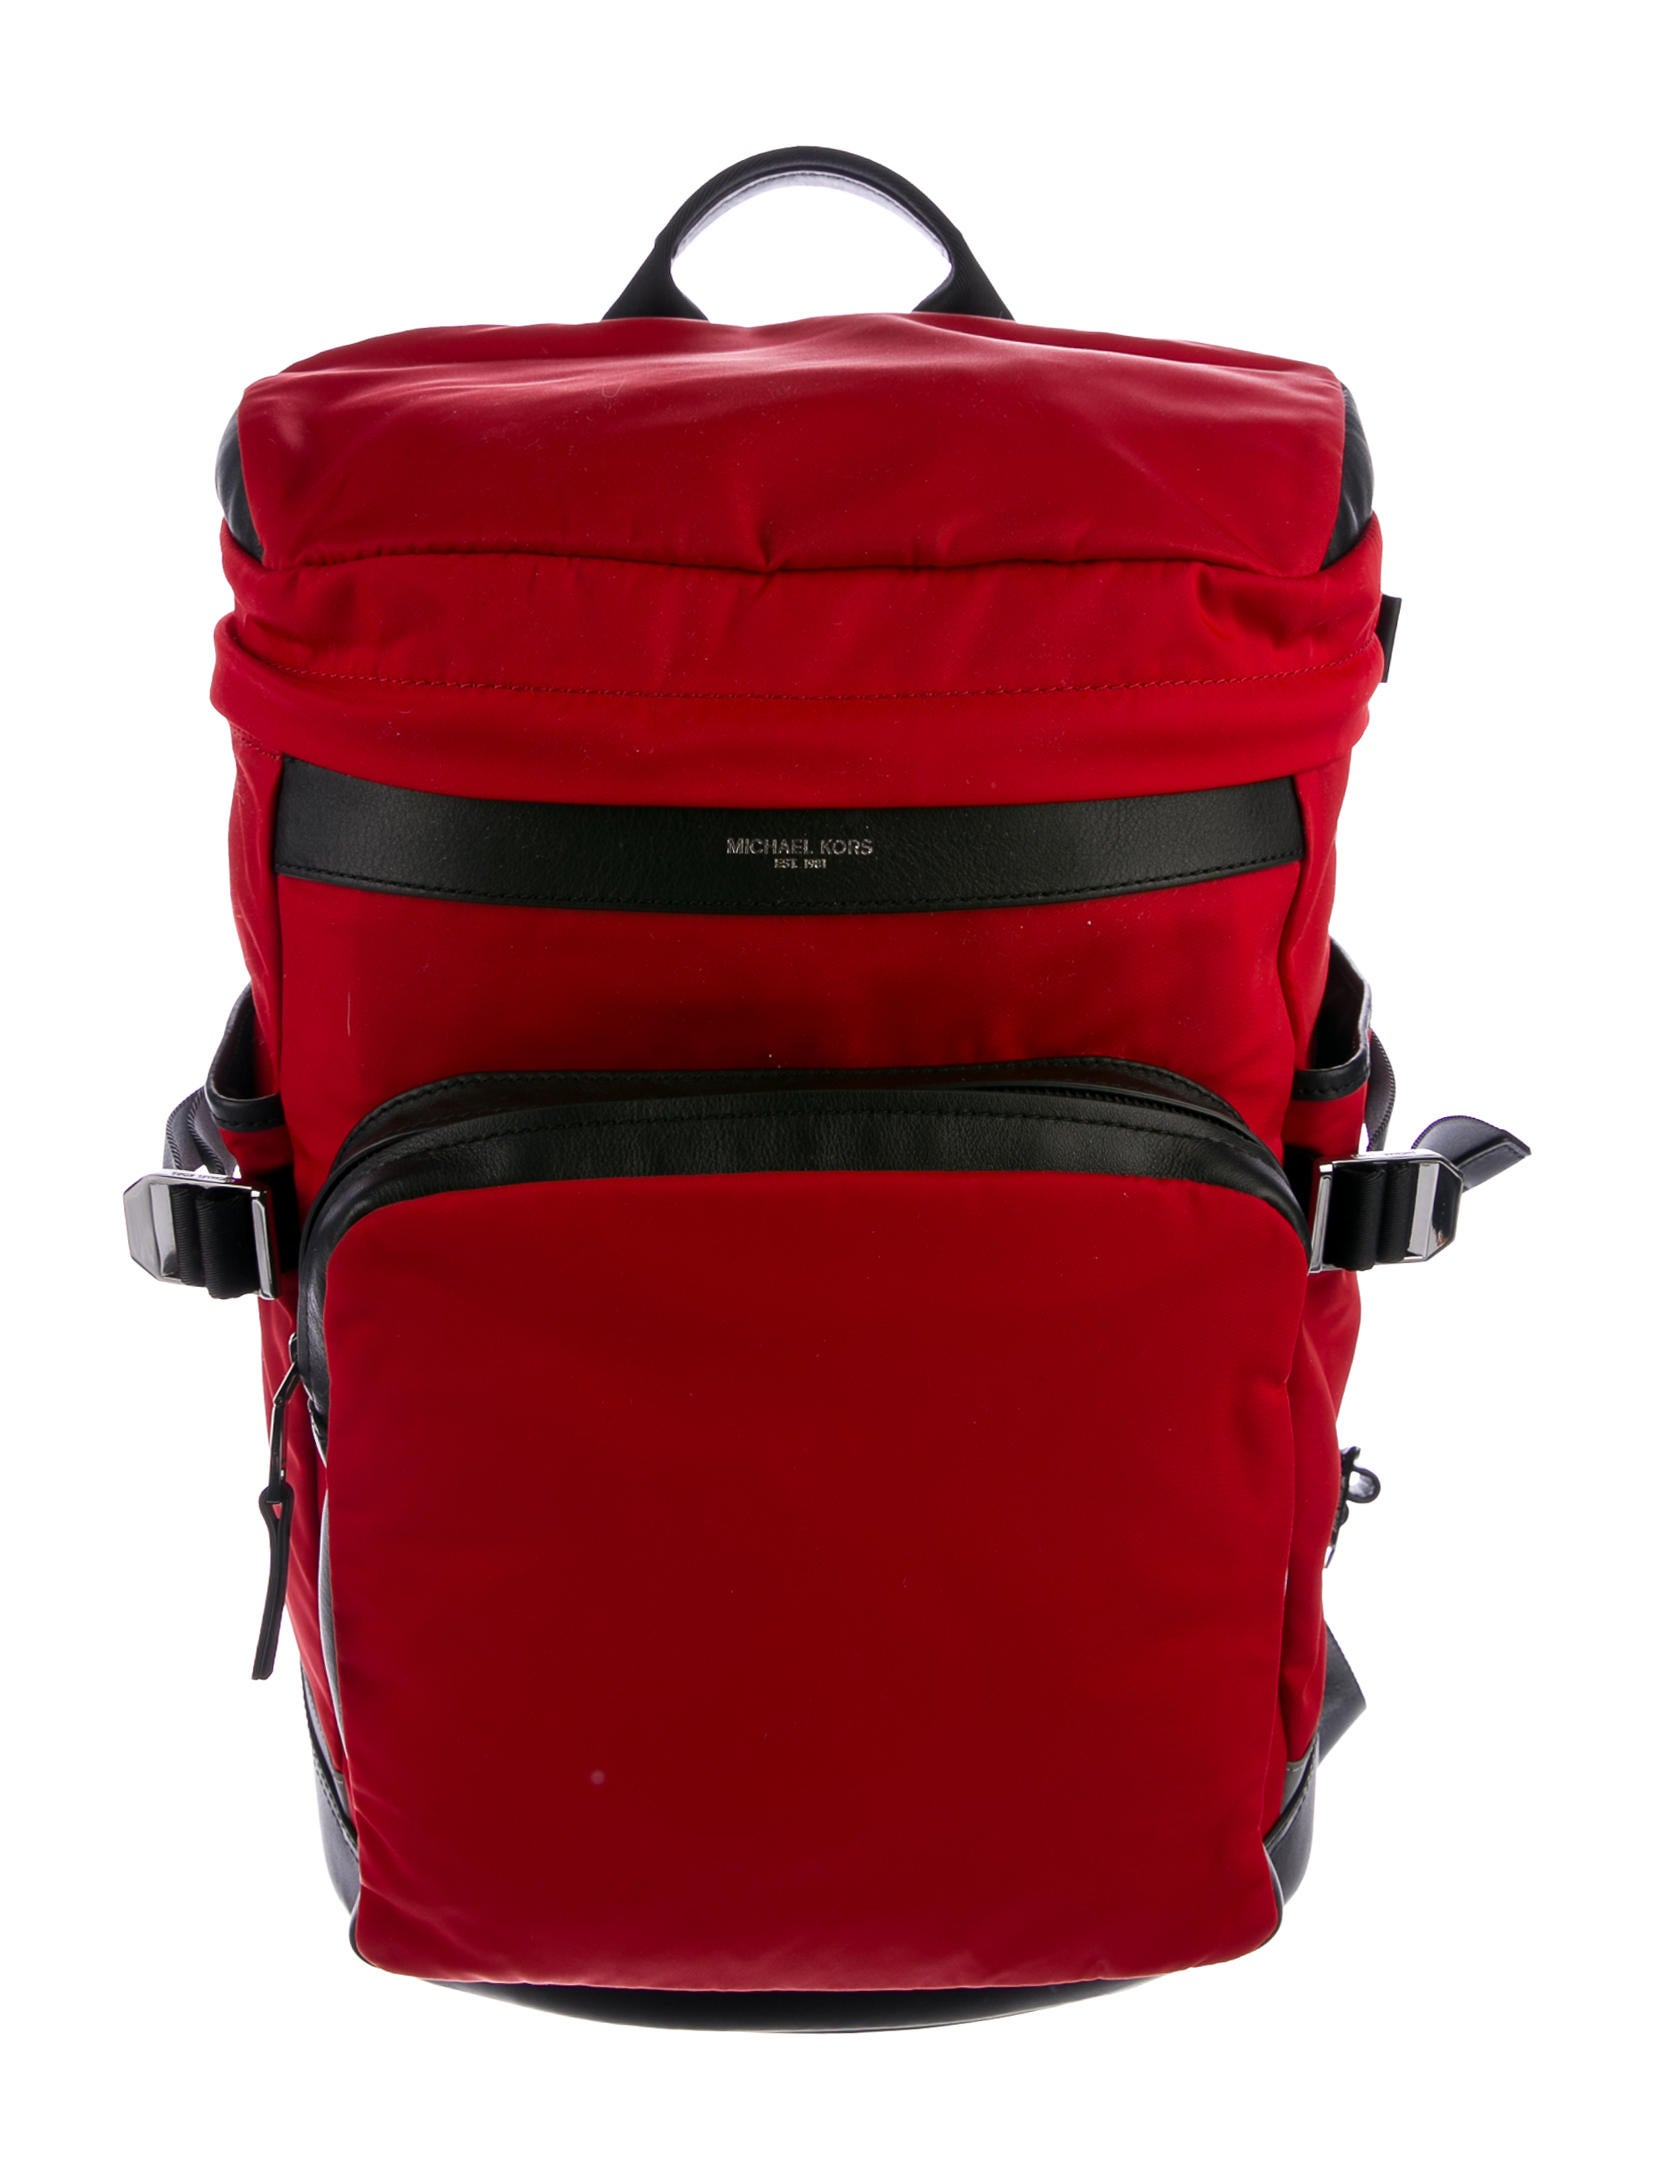 d71867133c96ef Michael Kors Kent Cycling Backpack w/ Tags - Bags - MIC57713 | The ...